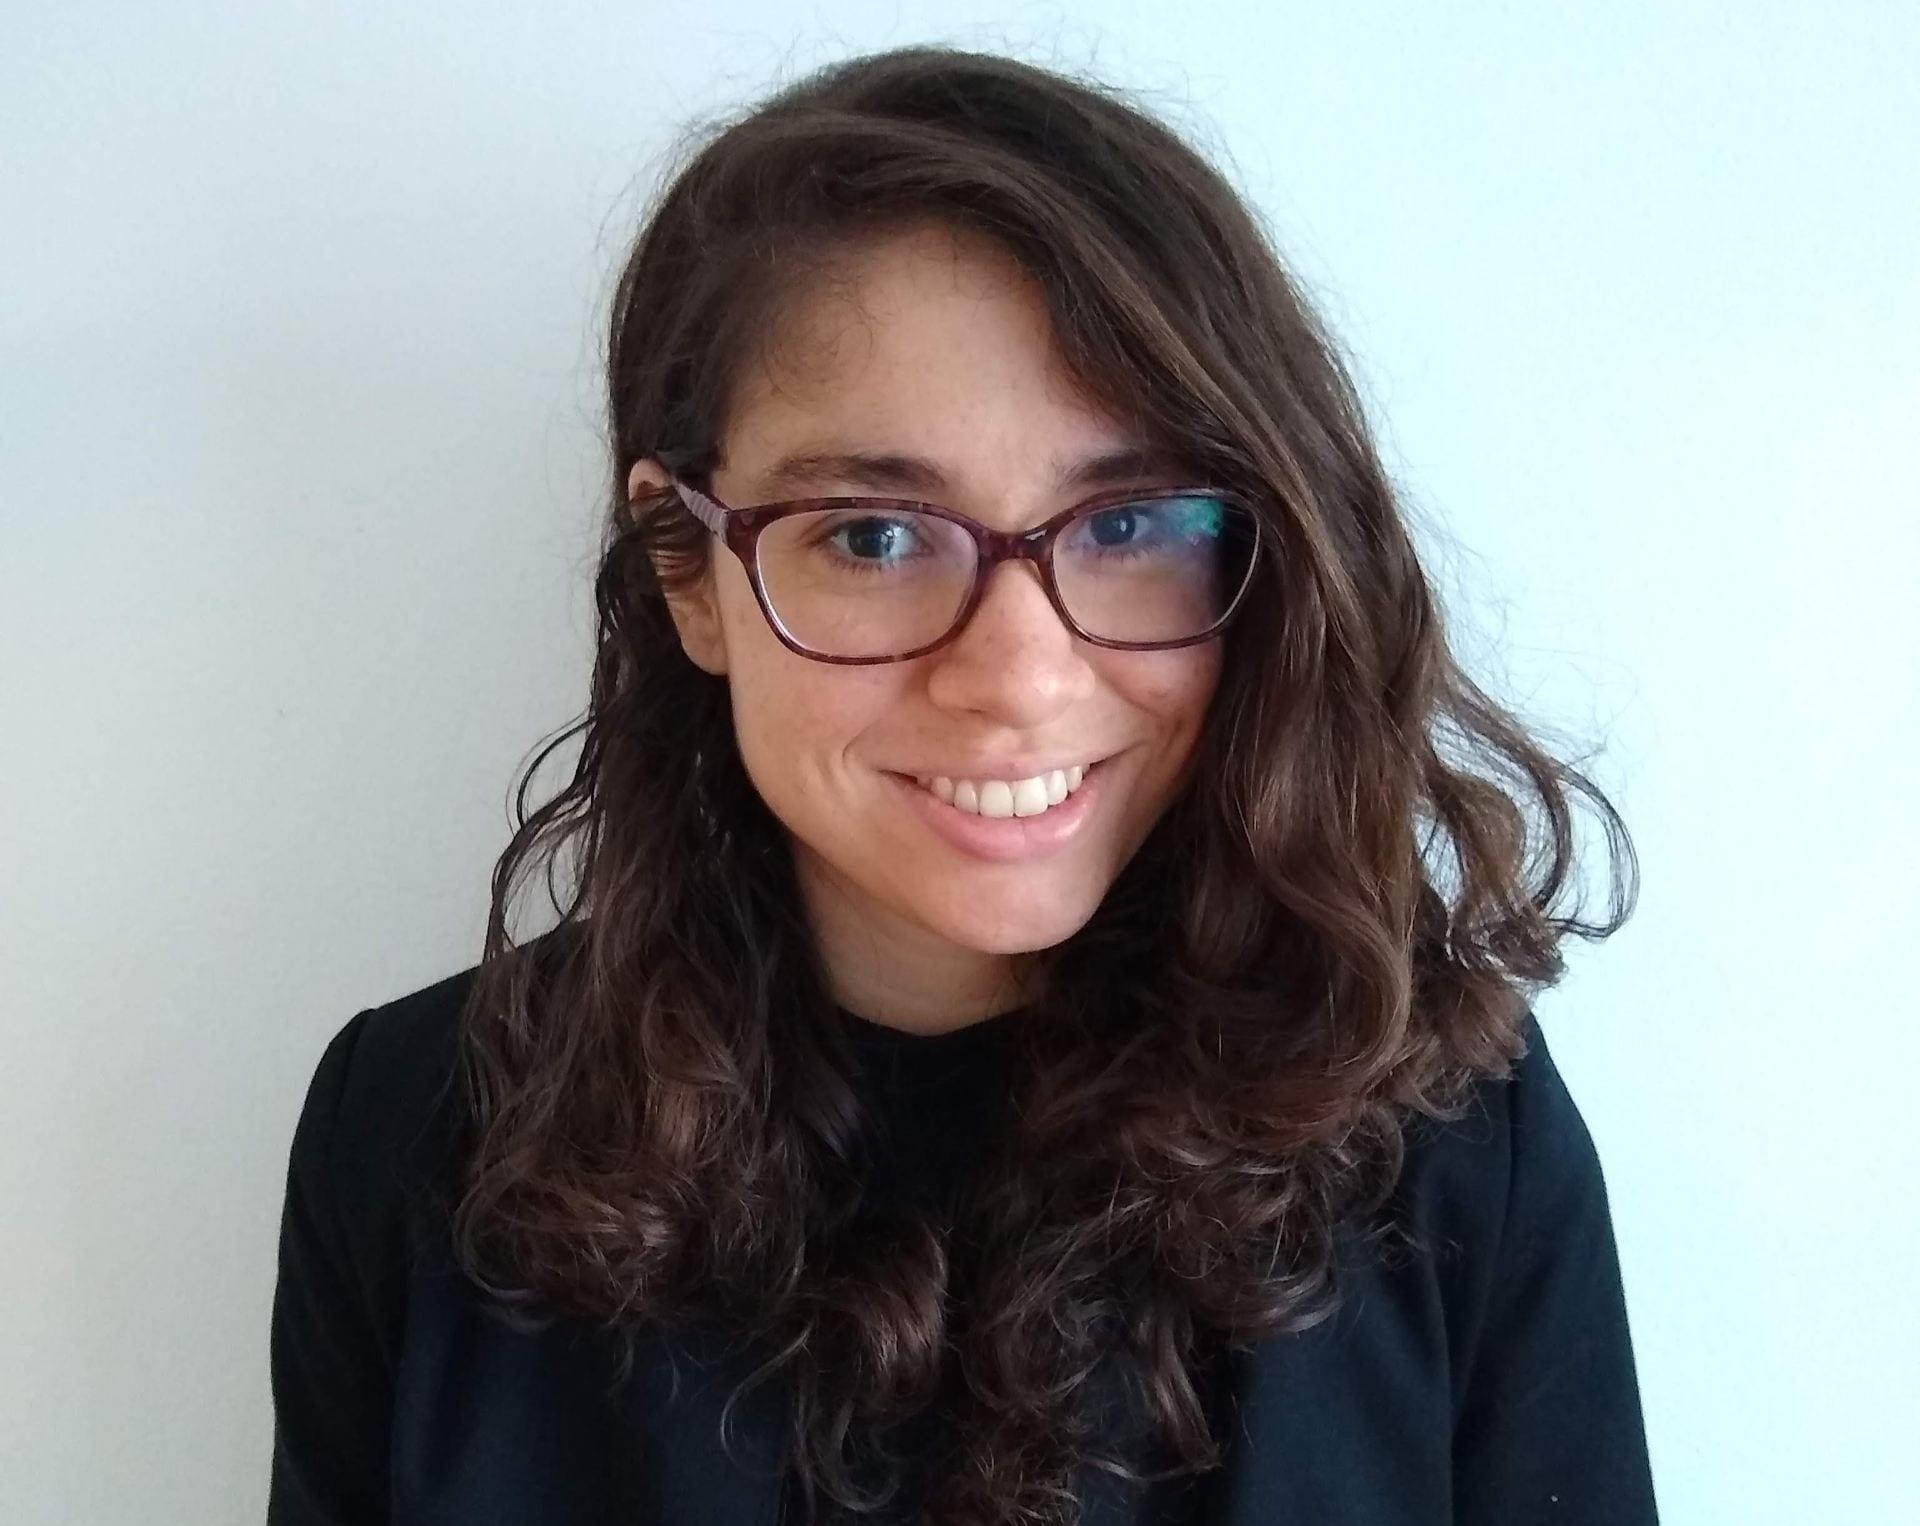 Isabela Quintela Matos